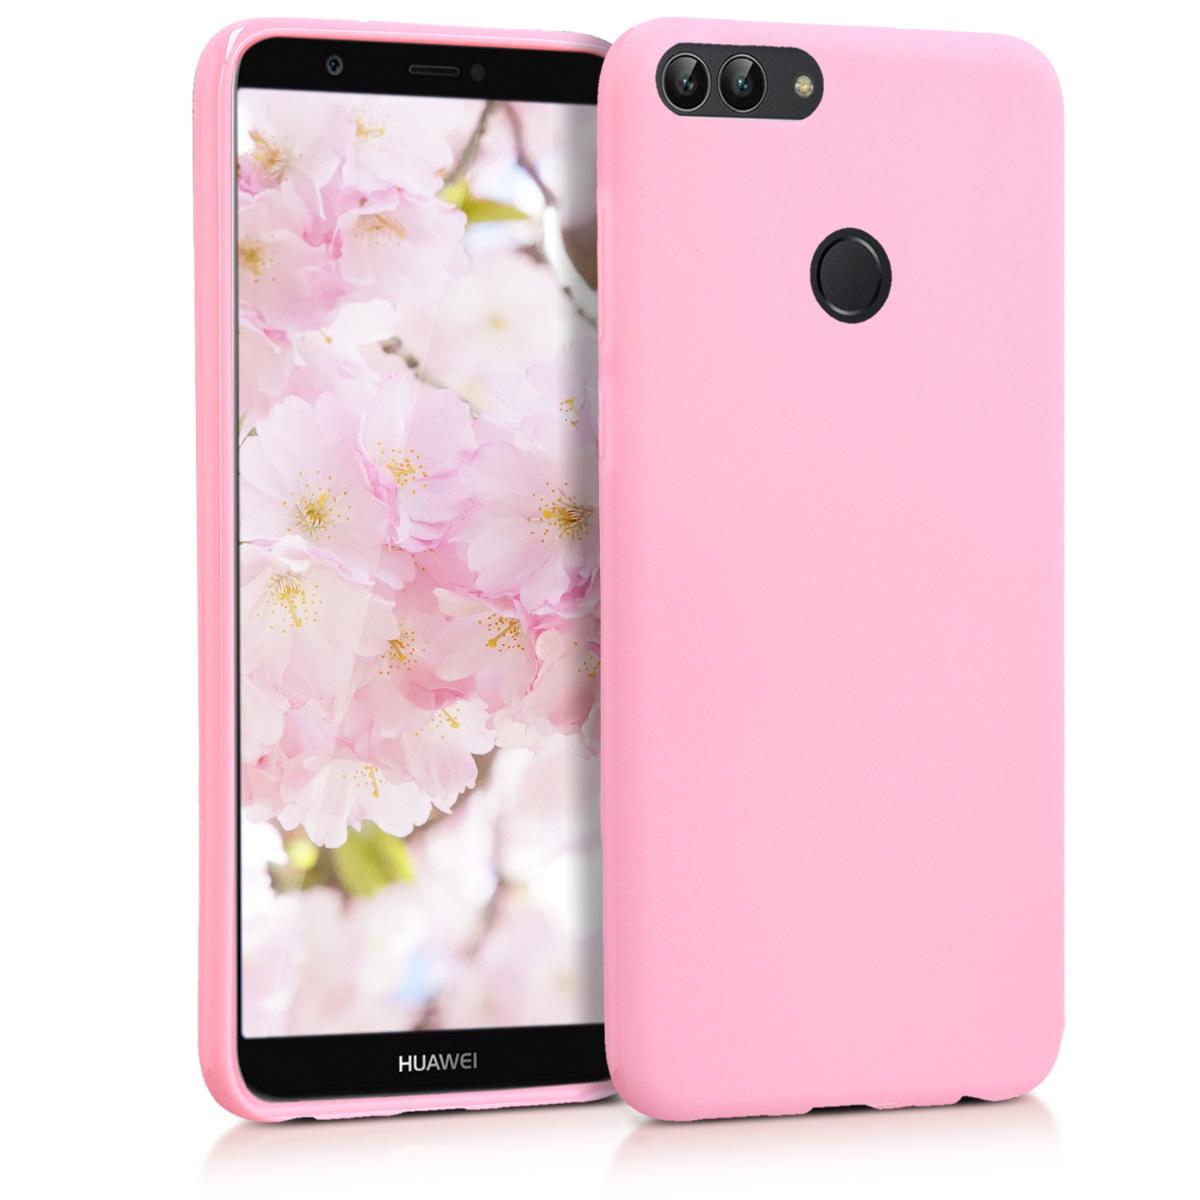 KW Θήκη Σιλικόνης Huawei P Smart - Antique Pink Matte (44124.52)